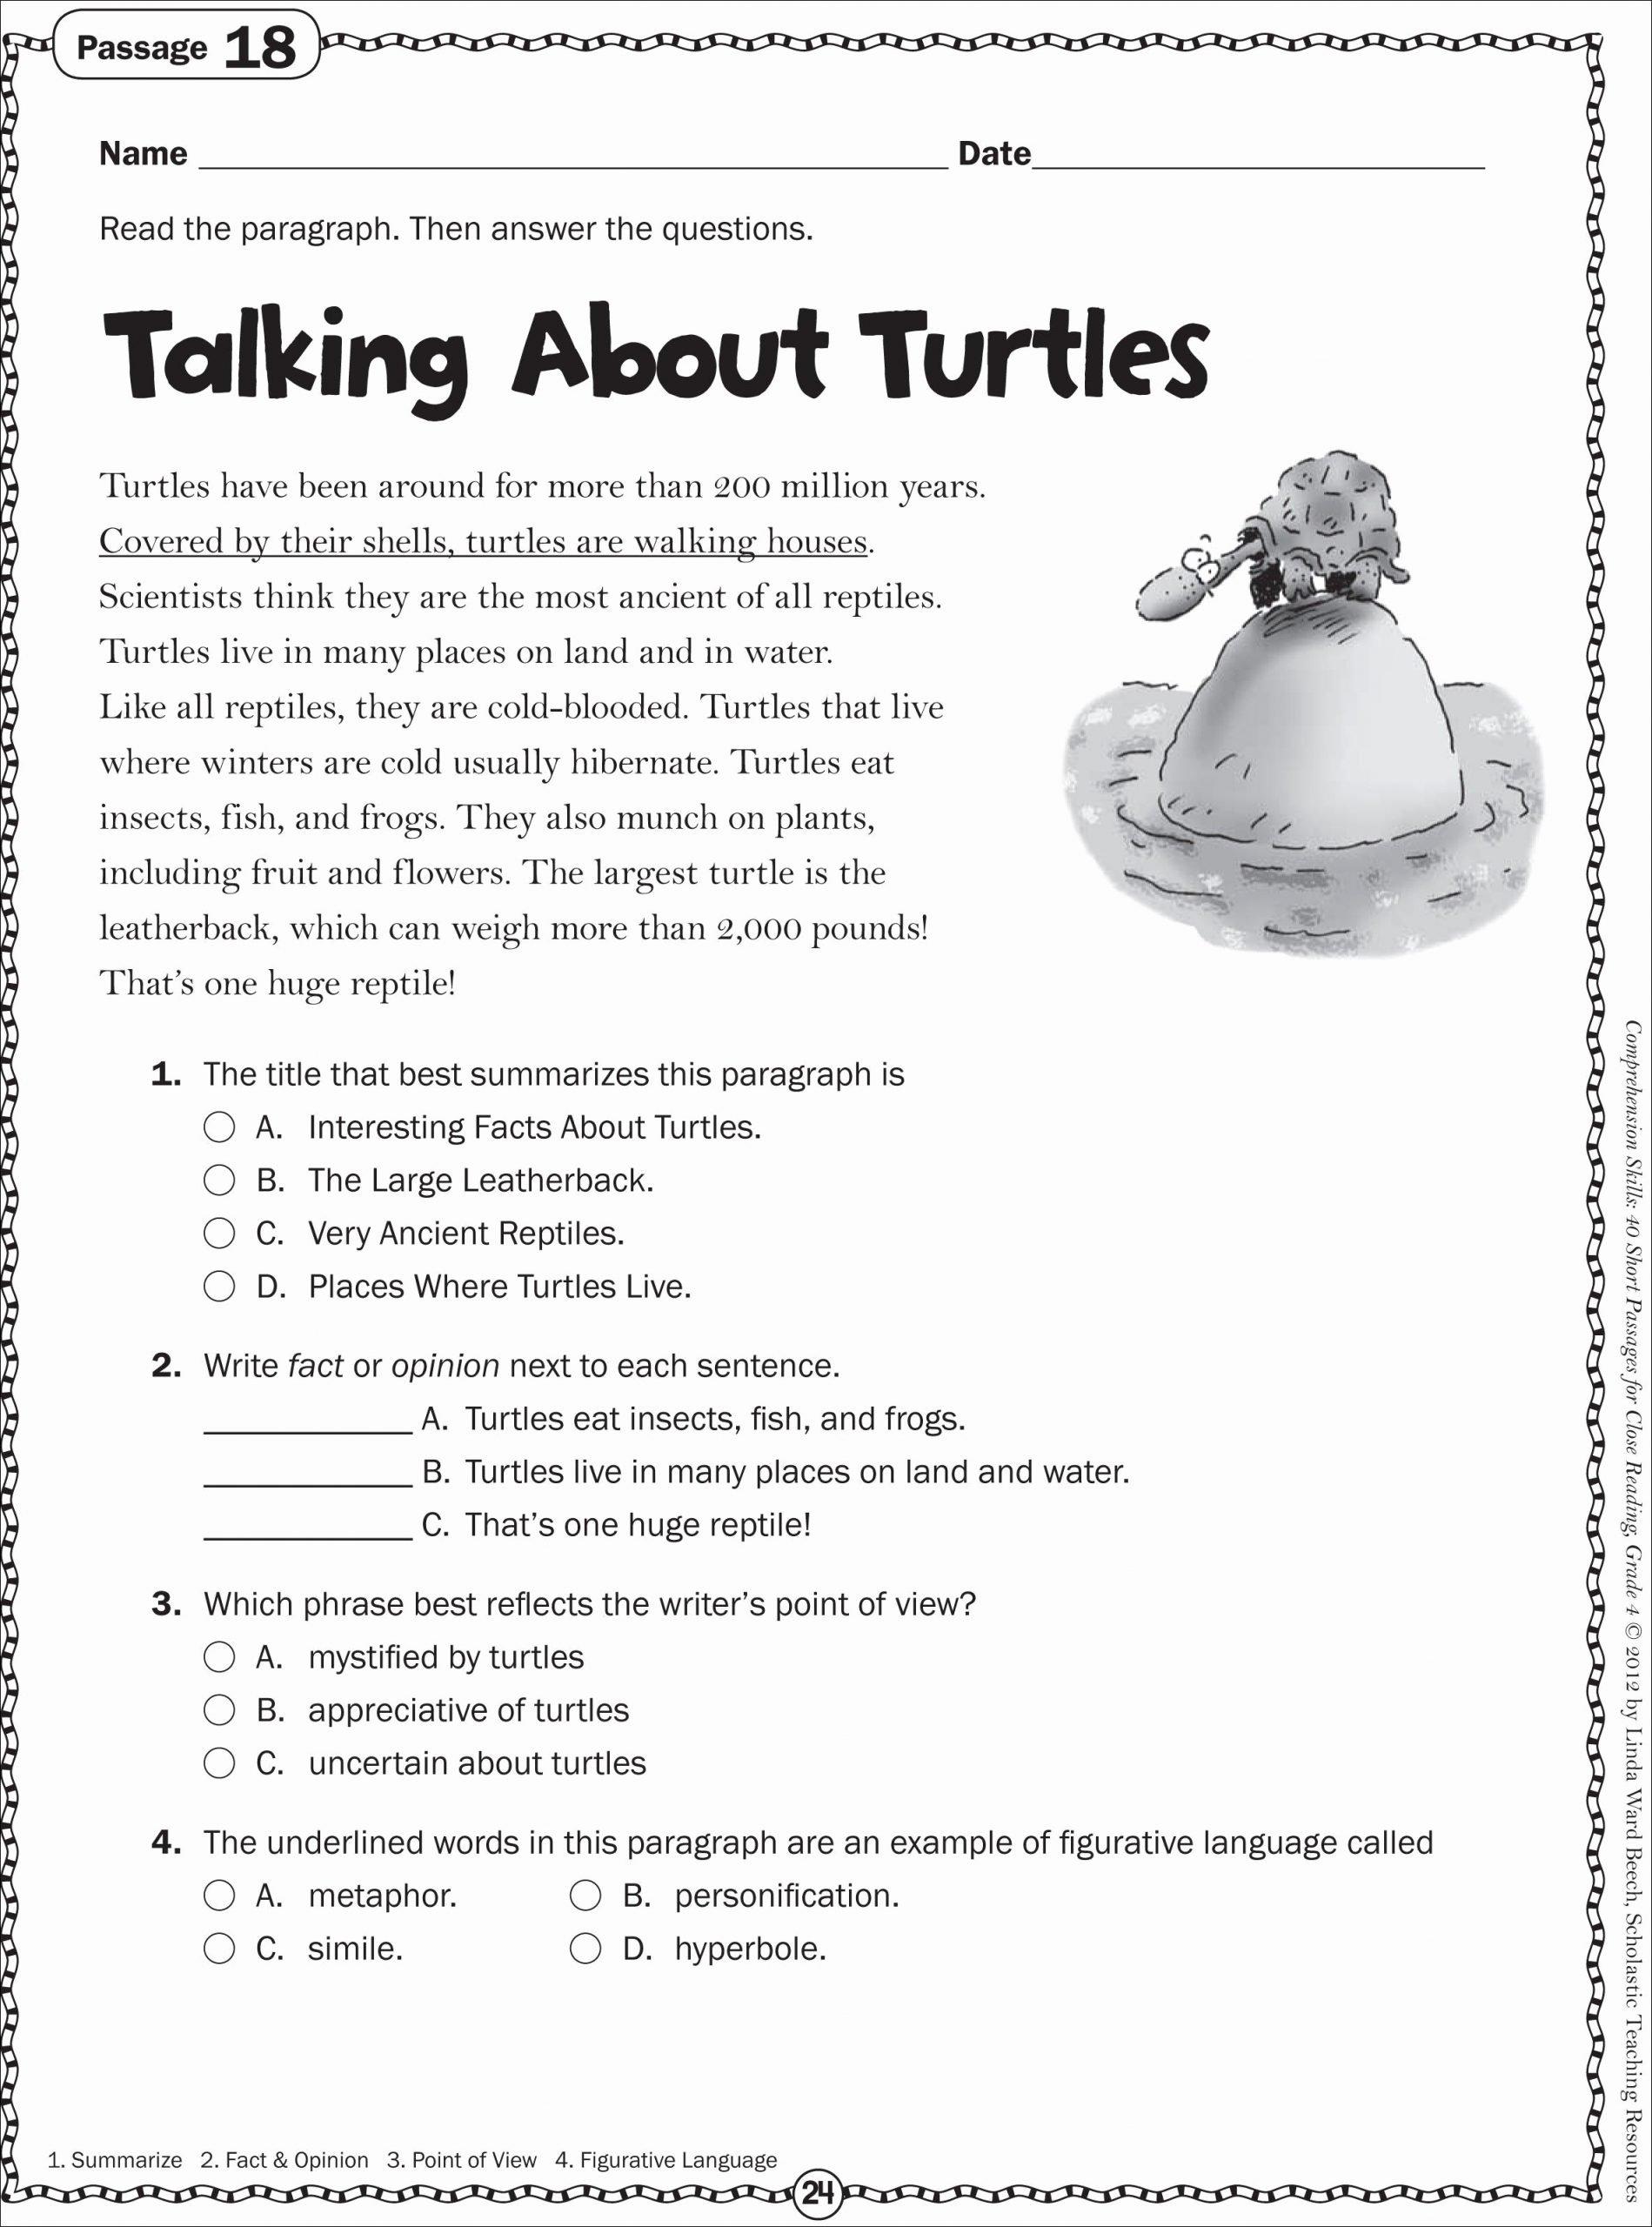 Free 7th Grade Reading Worksheets New Recent 7th Grade Language Arts Worksheets 7thgradeactscores